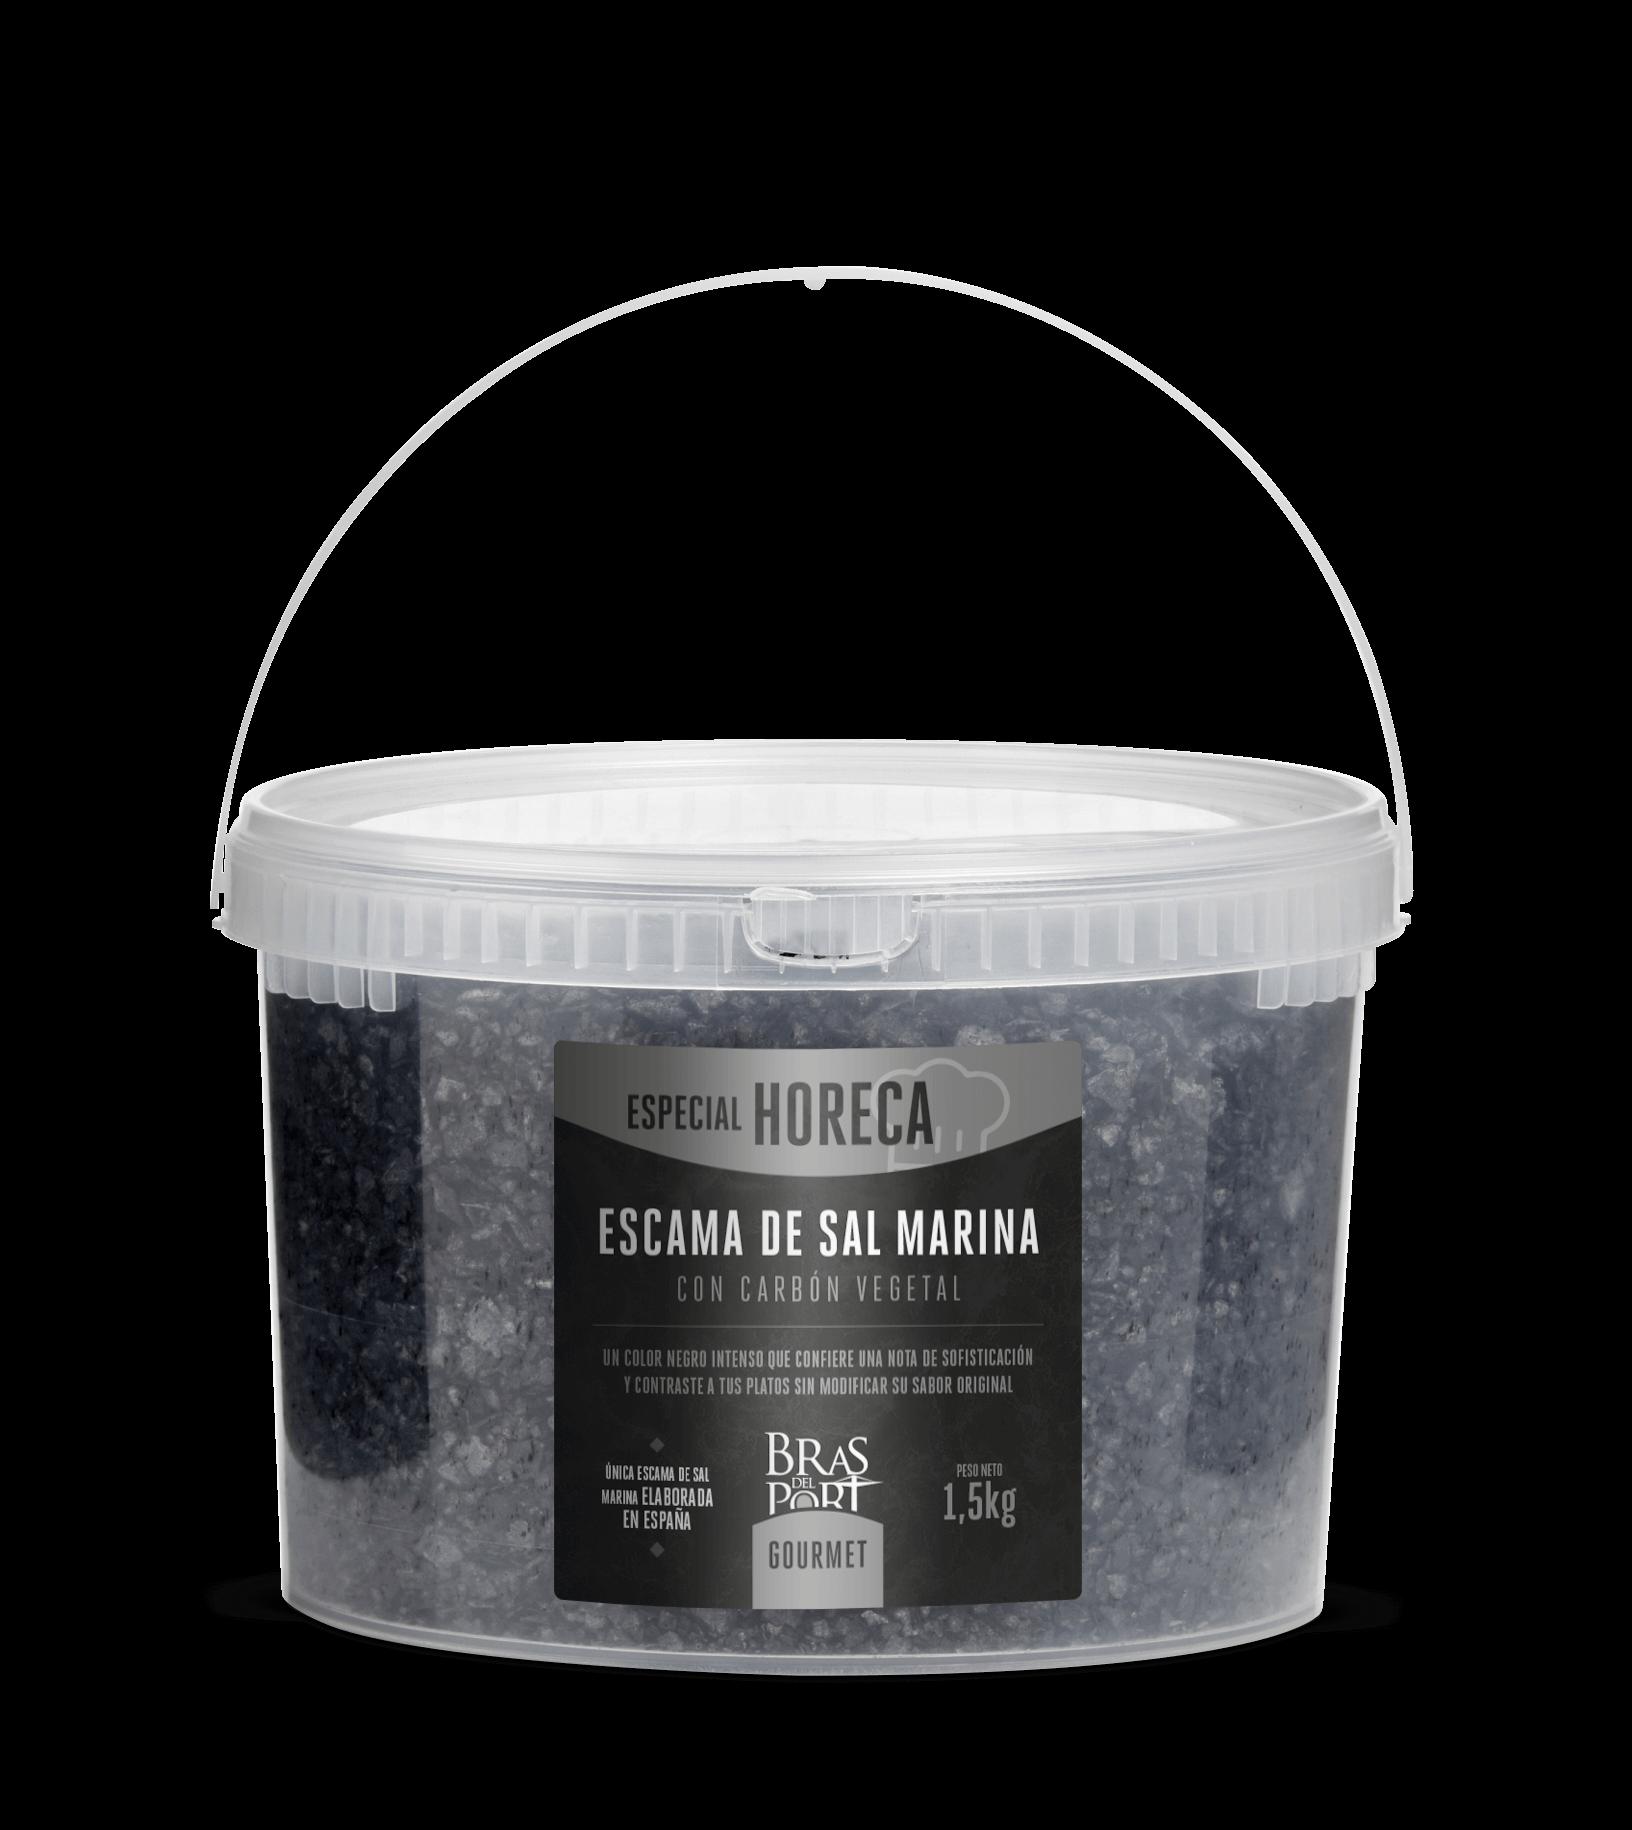 Bote de escama con carbón vegetal de 1500g